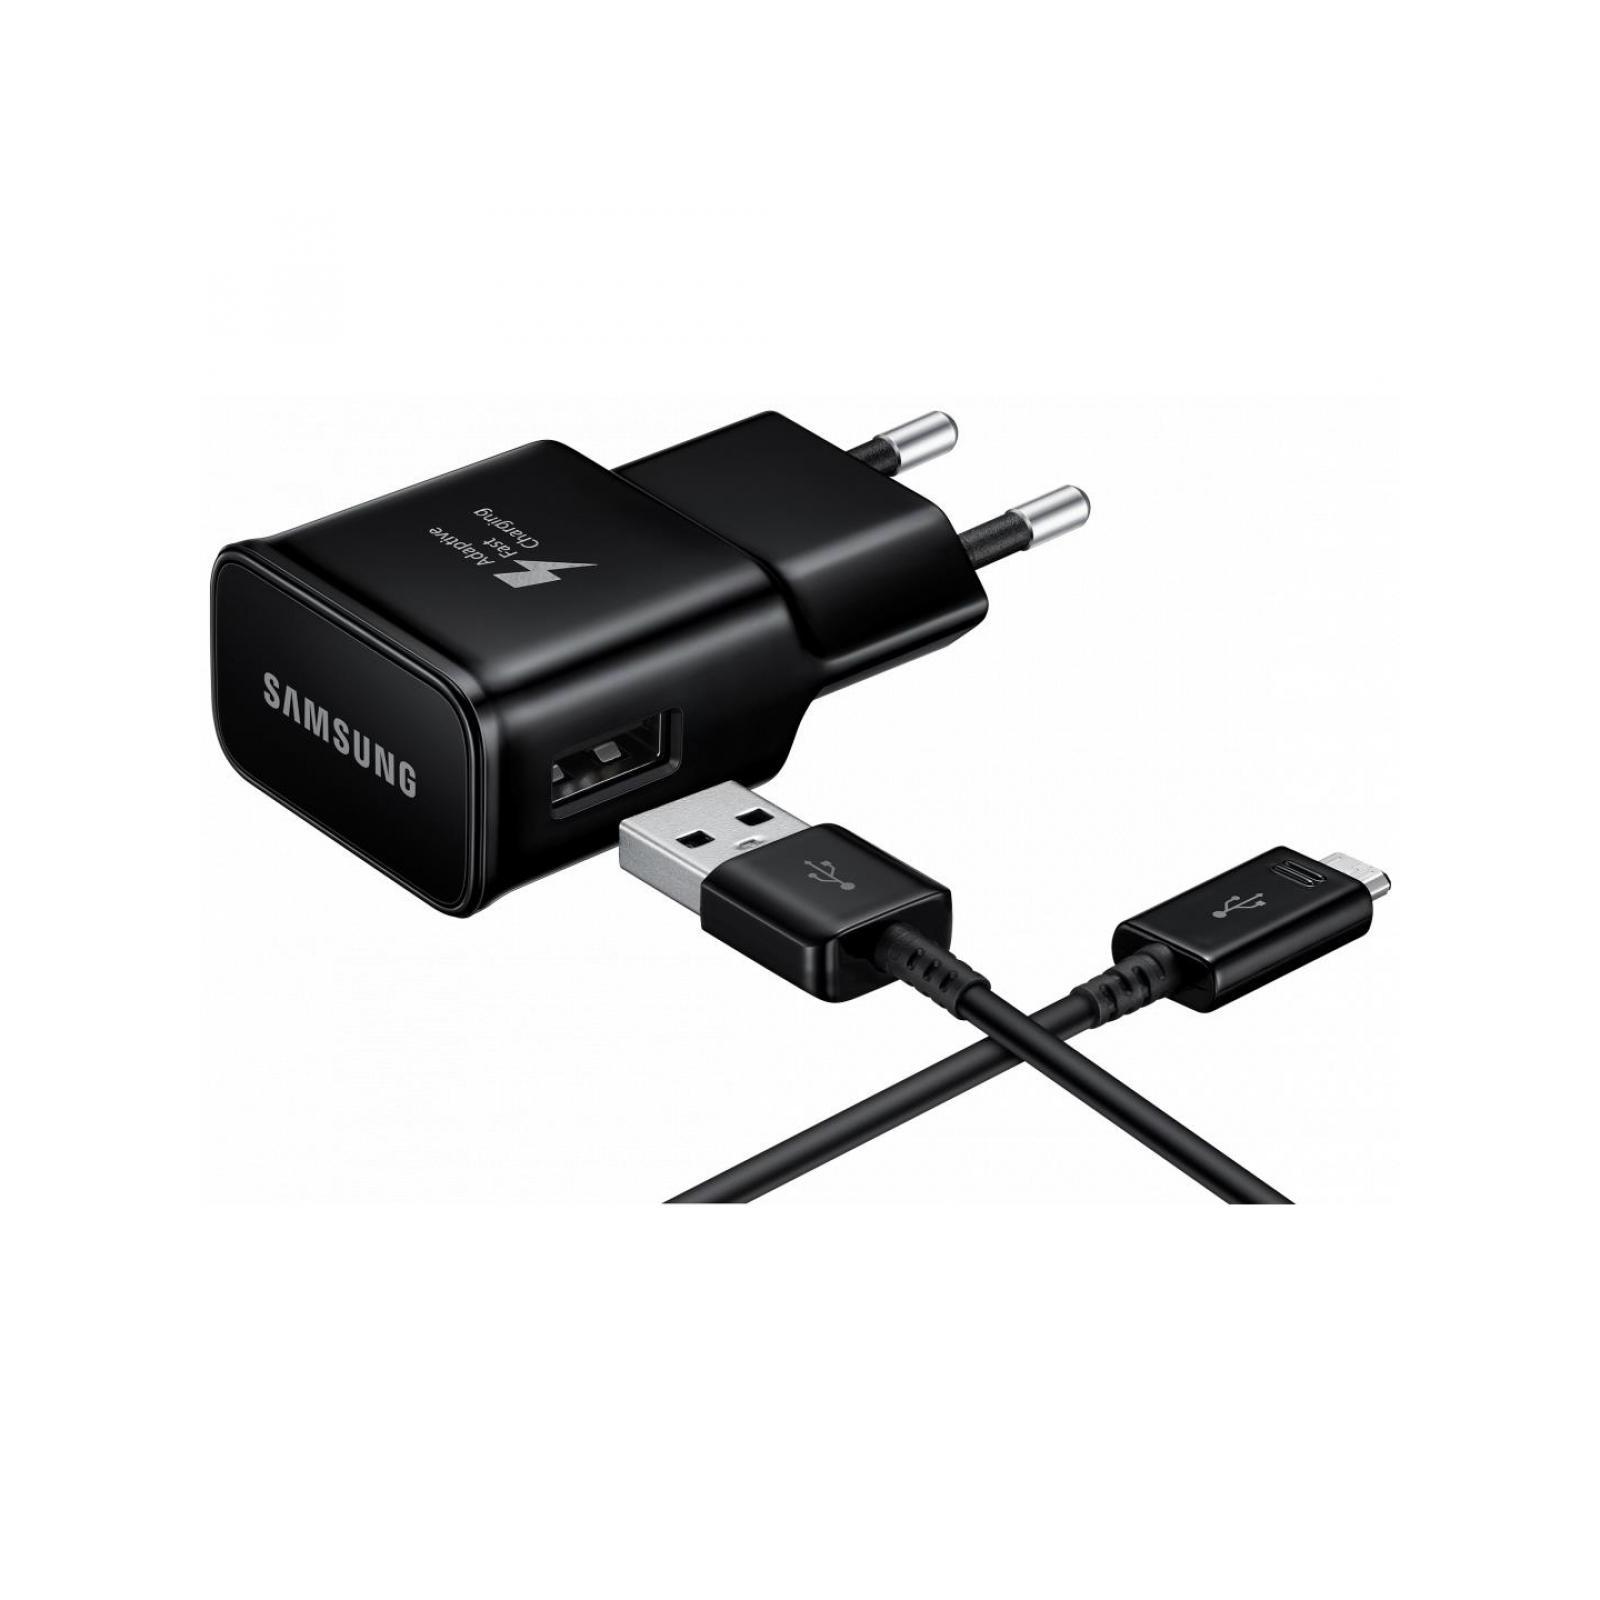 Зарядное устройство Samsung 2A + Type-C Cable (Fast Charging) Black (EP-TA20EBECGRU) изображение 4